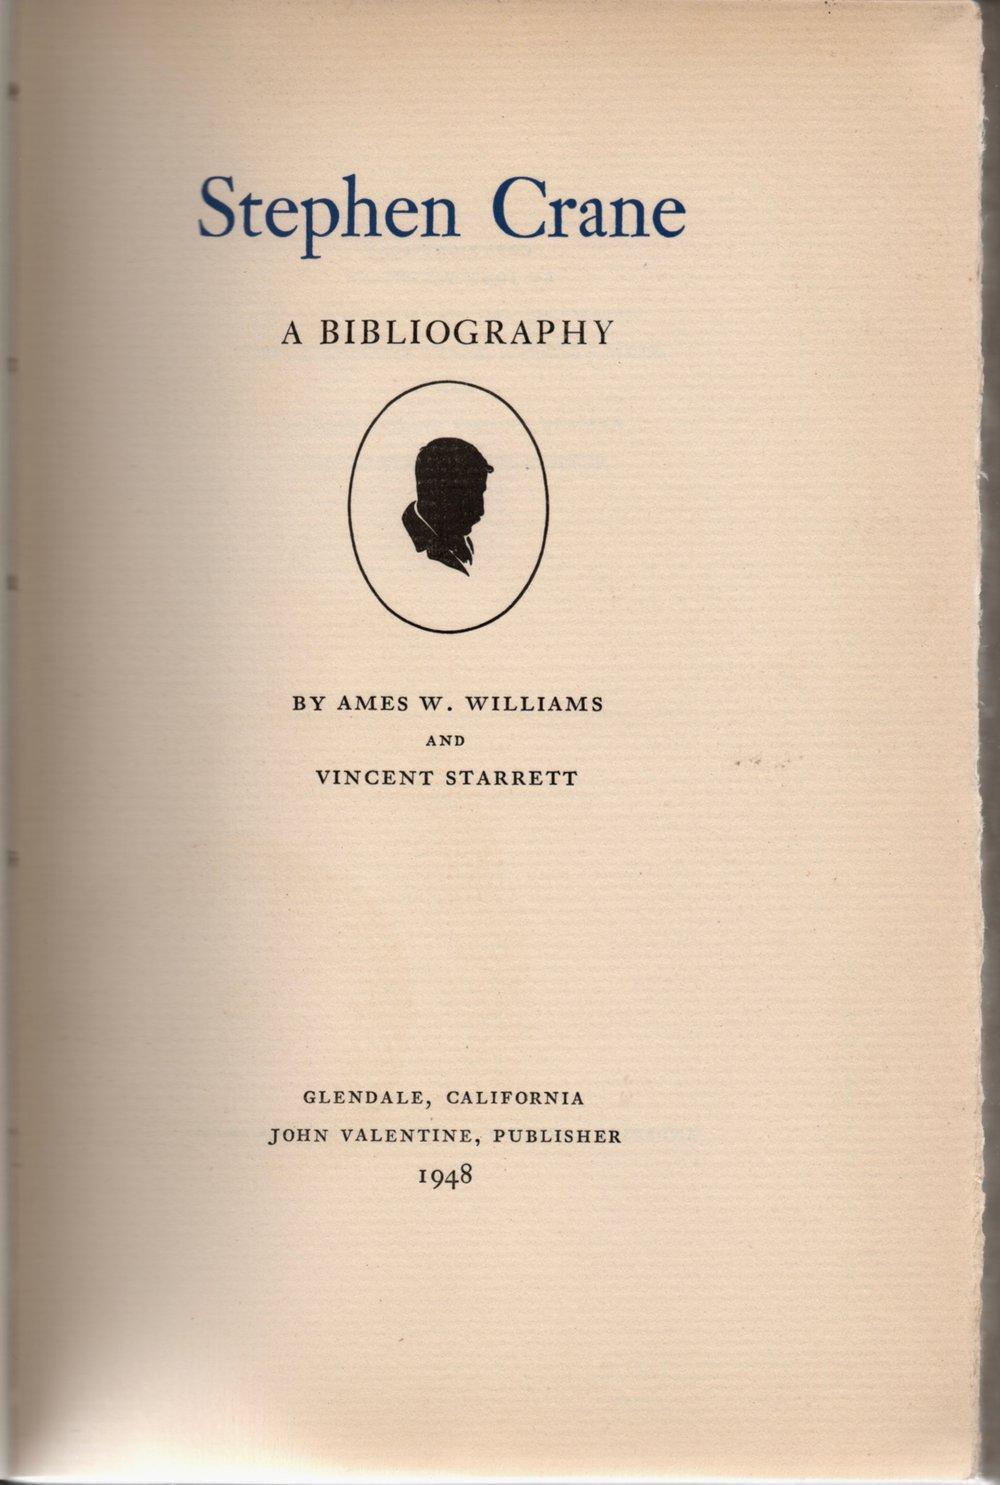 Stephen Crane biblio title page.jpg